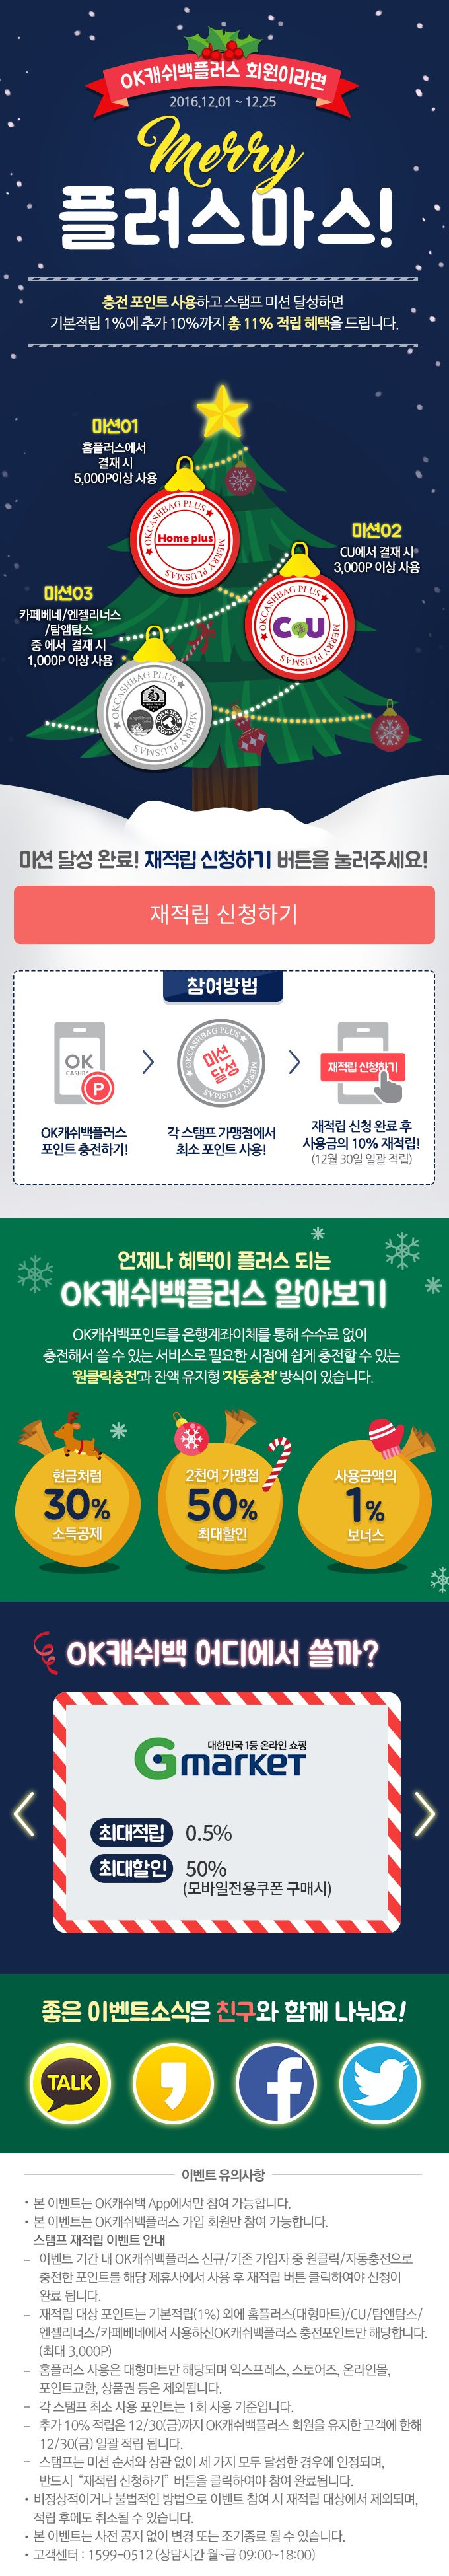 OK캐쉬백플러스 12월 크리스마스 겨울 이벤트